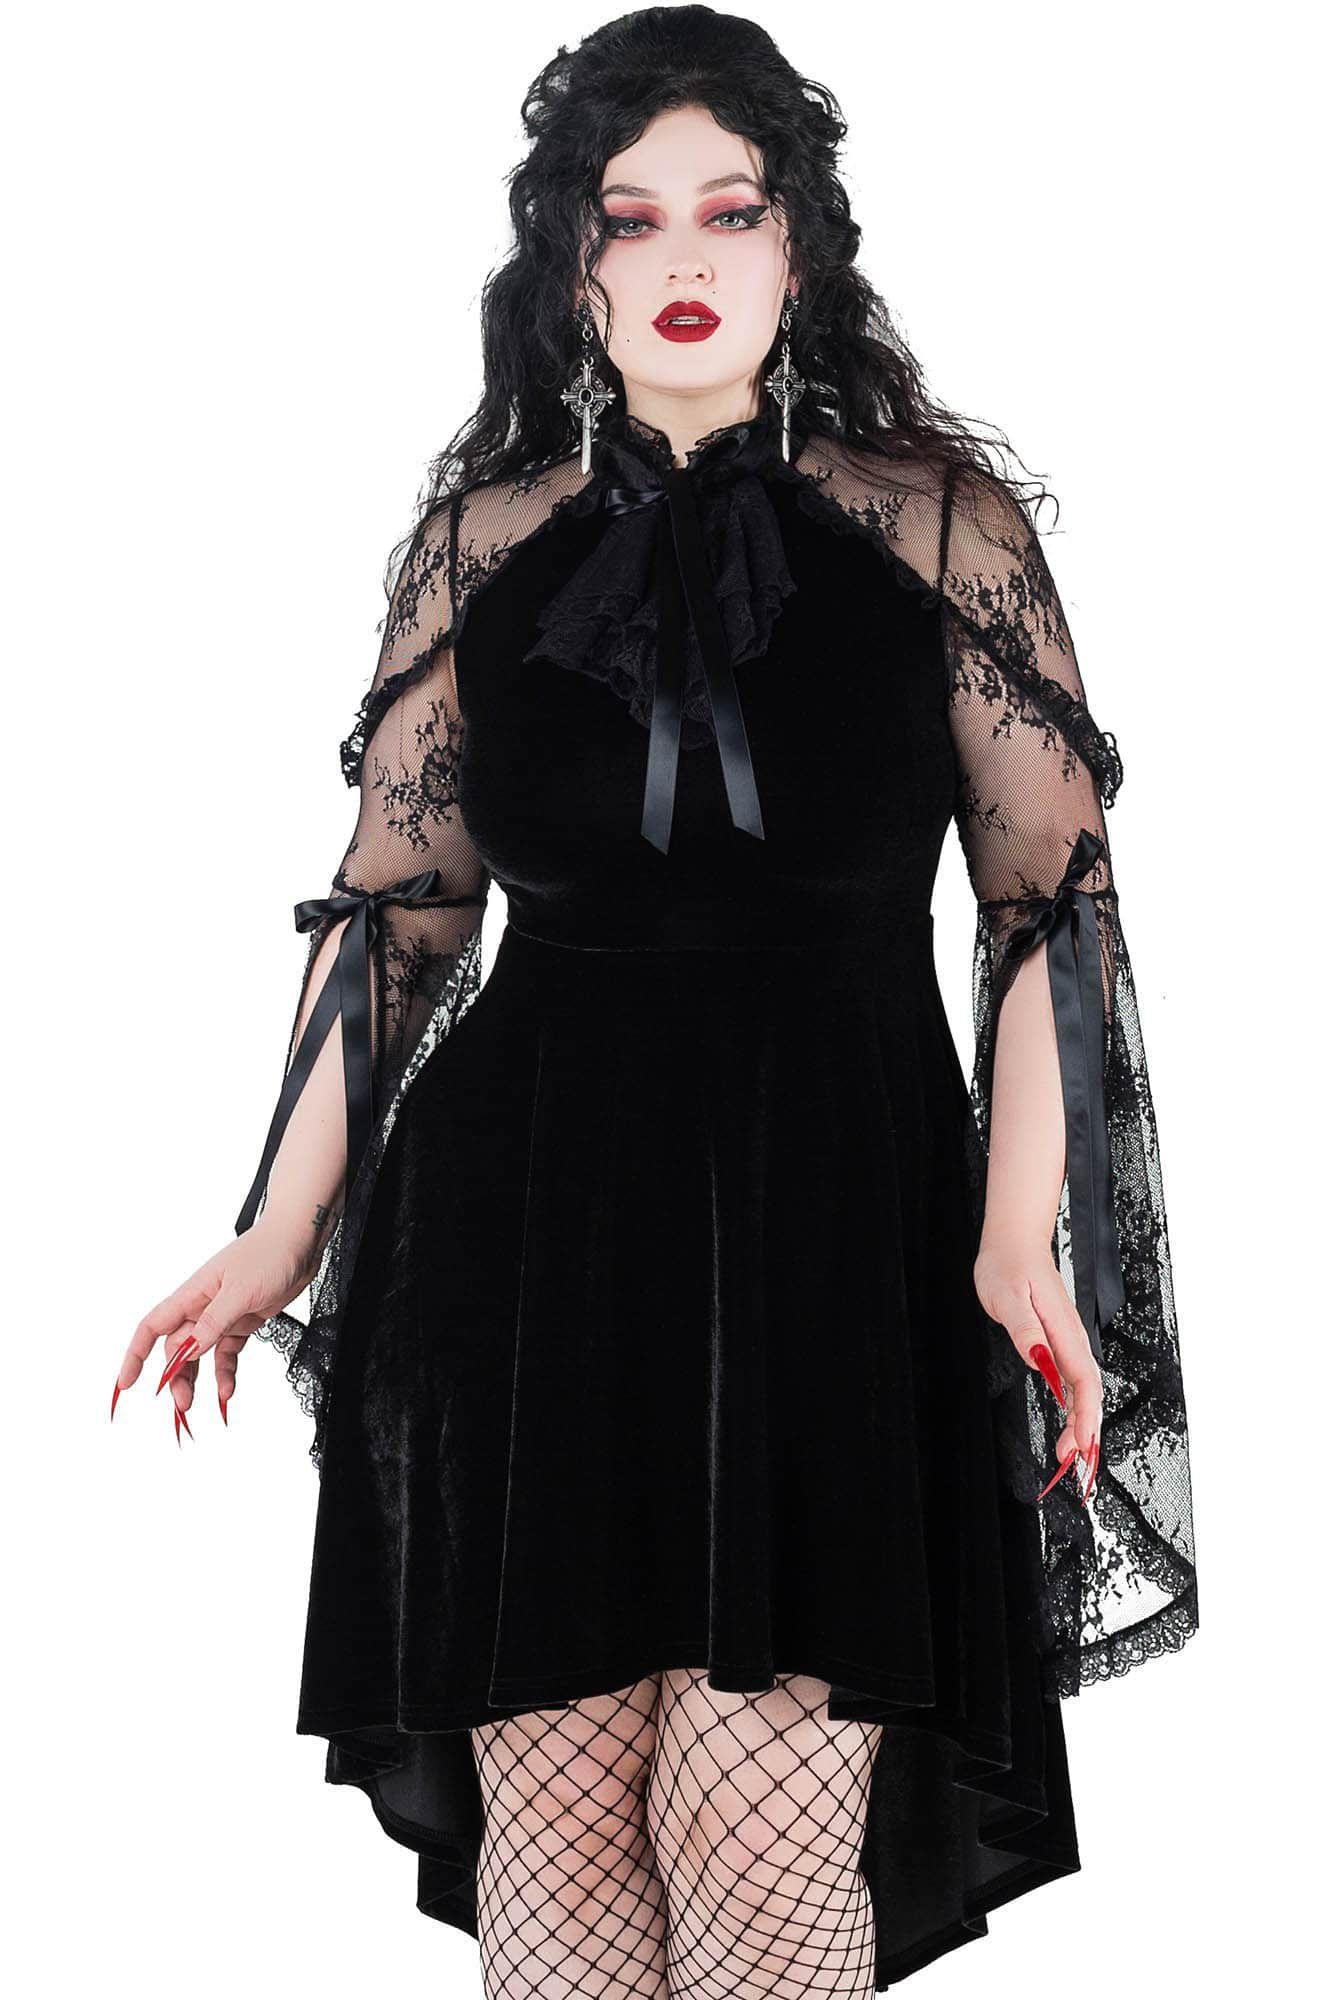 KS02970_robe-gothique-glam-rock-killstar-verullian